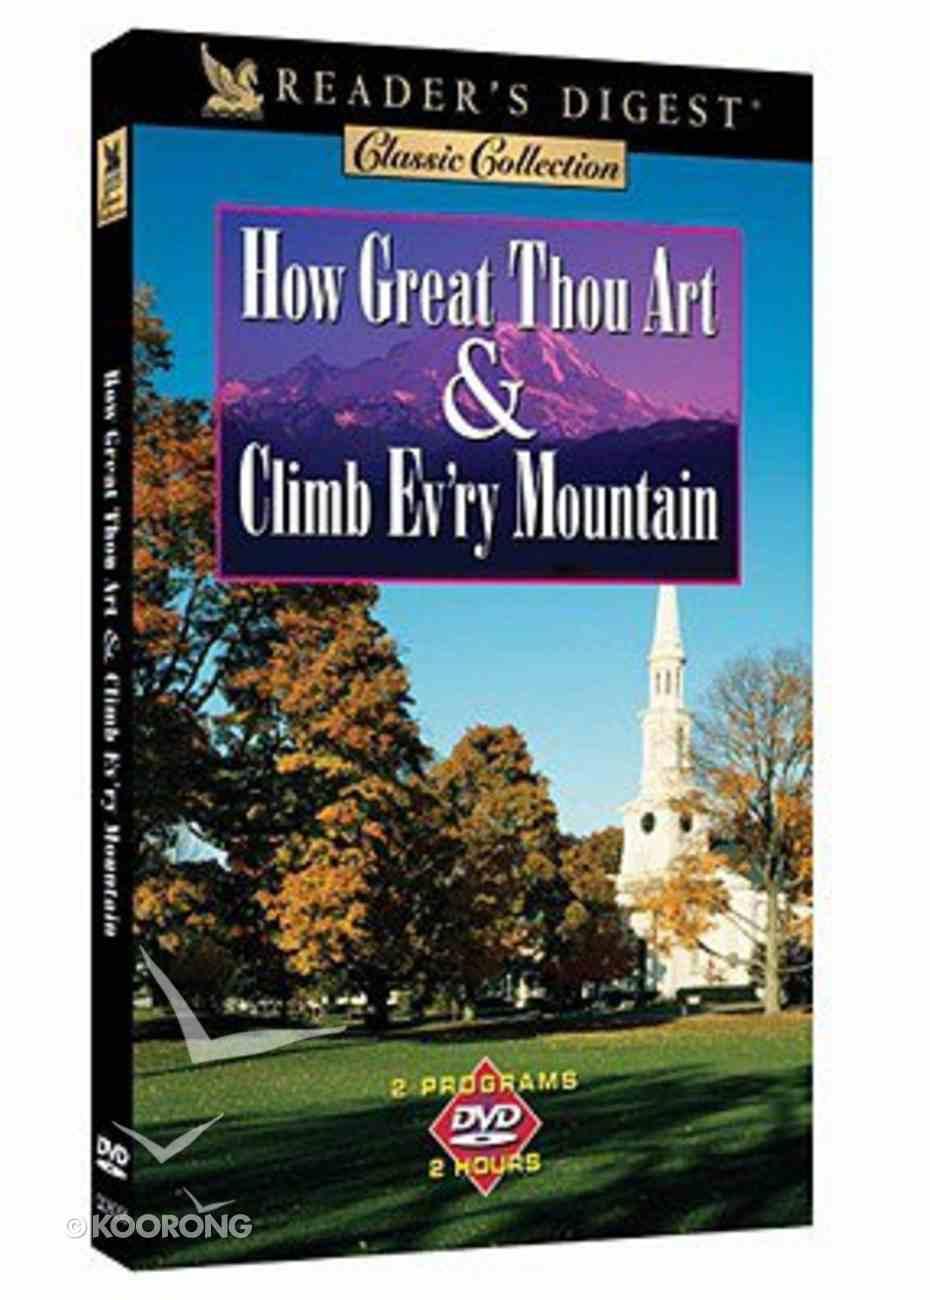 How Great Thou Art & Climb Every Mountain DVD